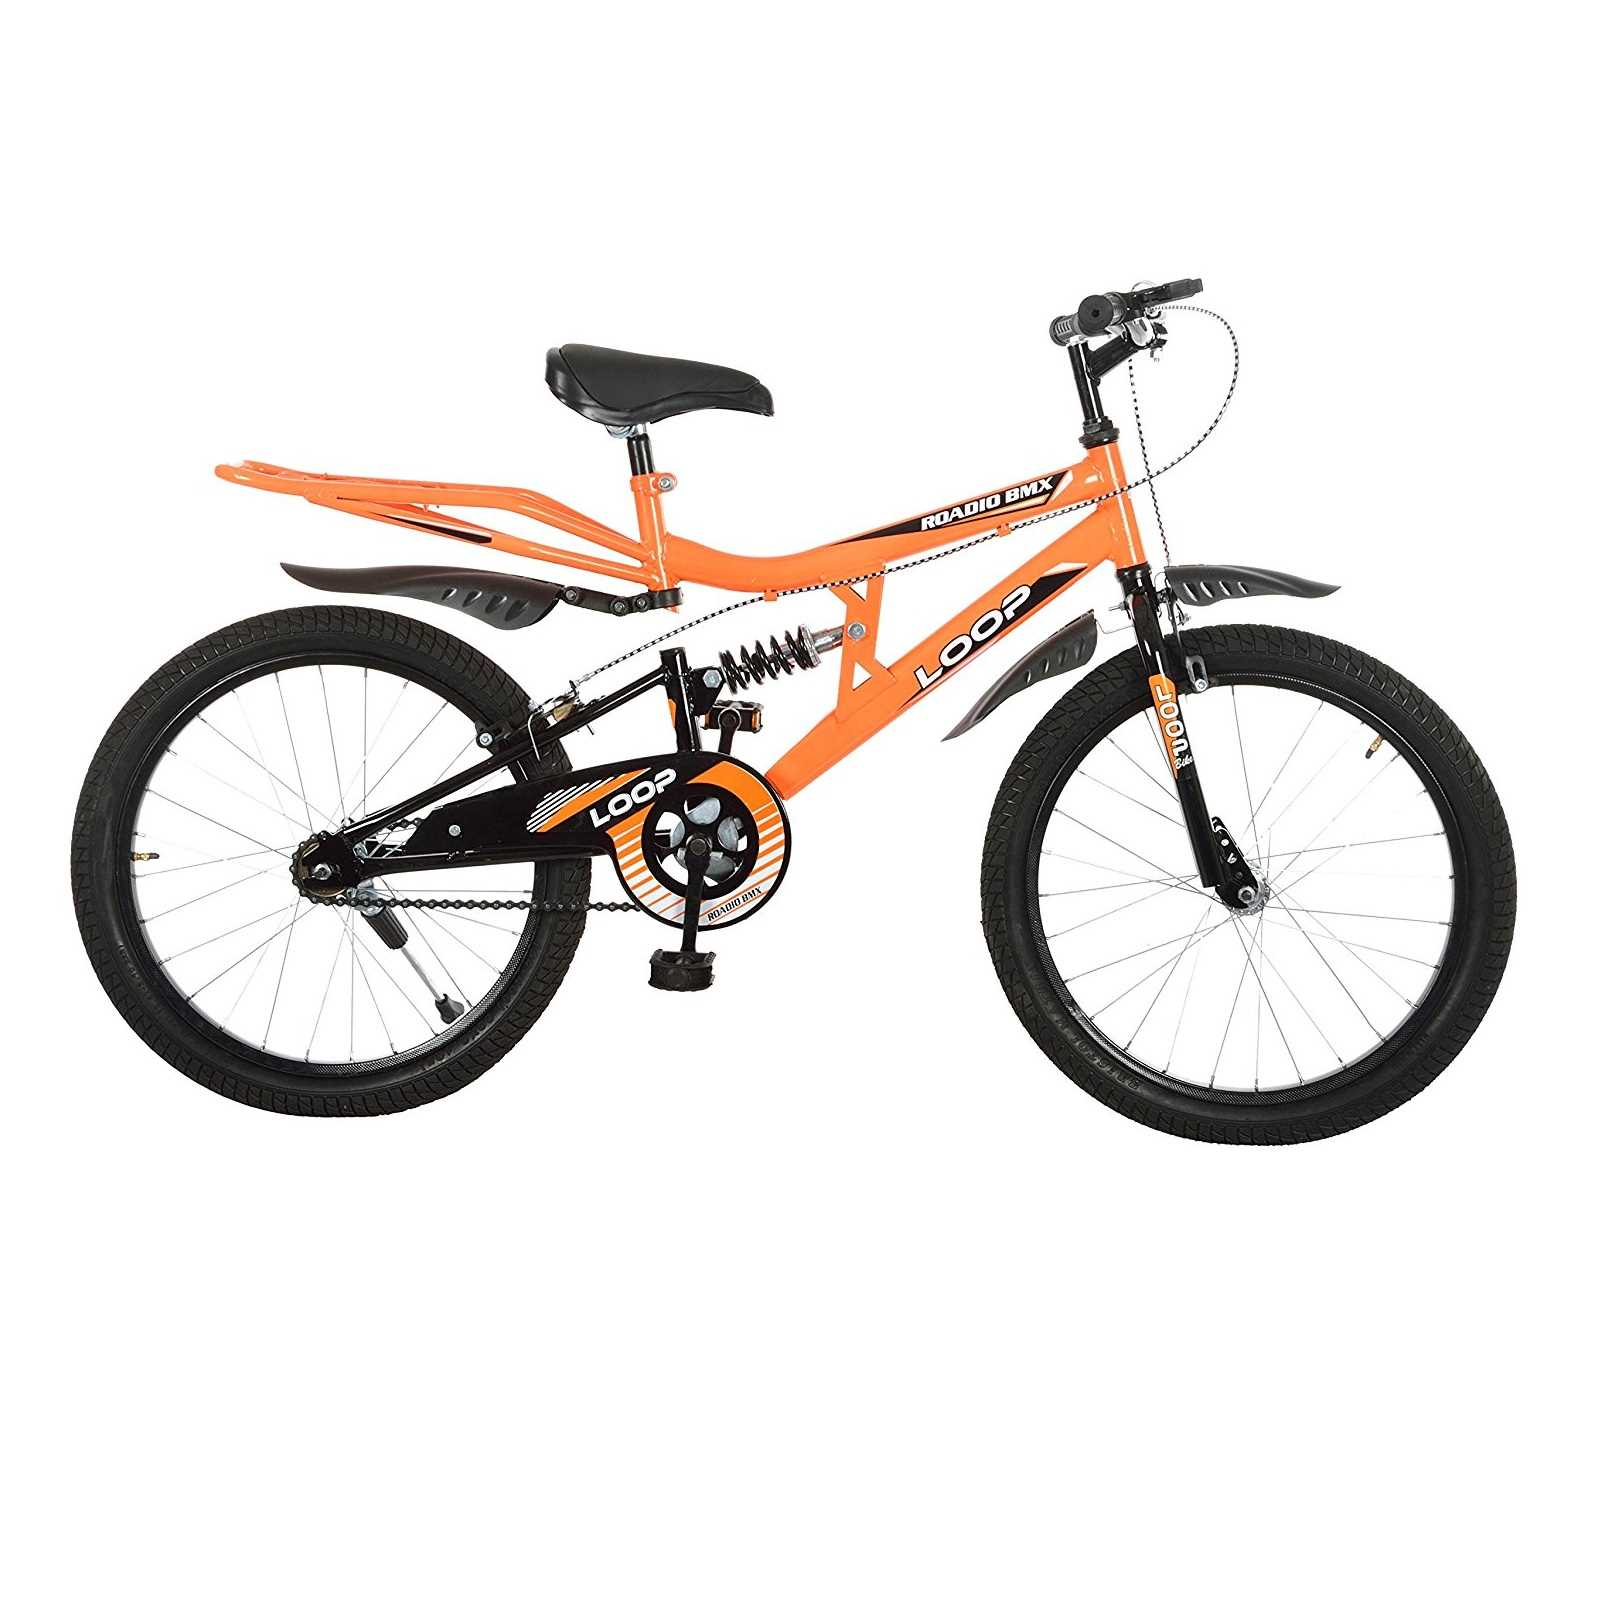 Loop Bikes Roadio Bmx 20 Inch Bicycle Price {11 Dec 2018} | Roadio ...